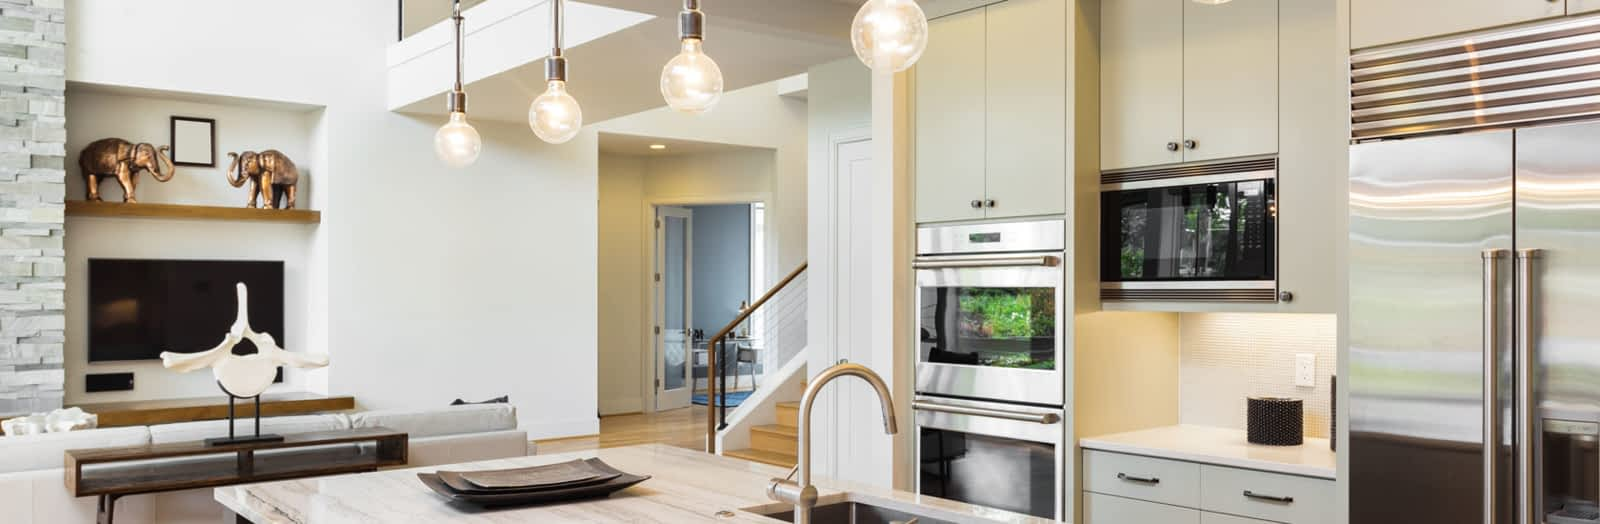 Canadian Home Renovations Ltd - Opening Hours - Edmonton, AB